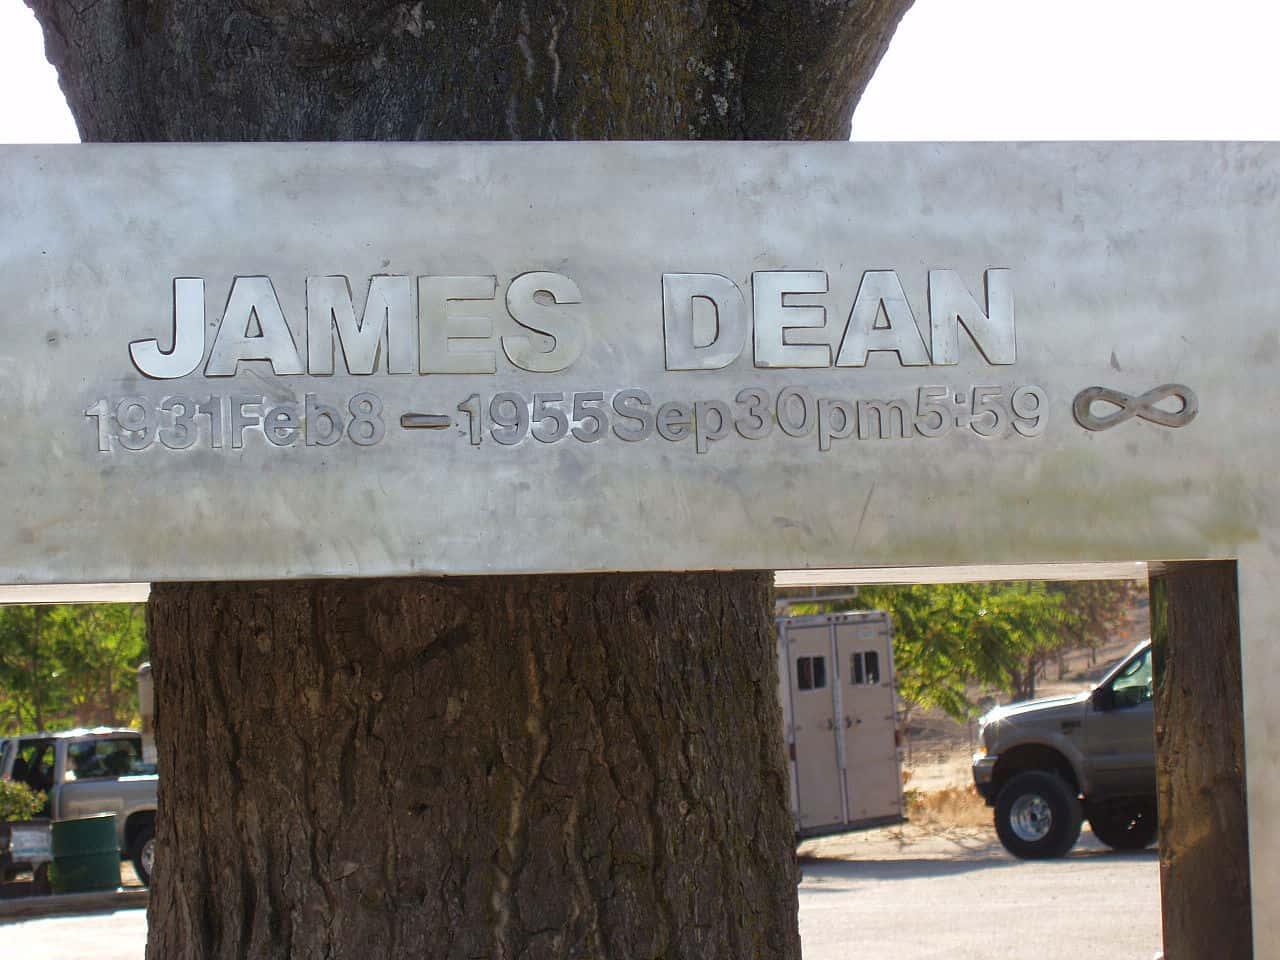 James Dean Facts